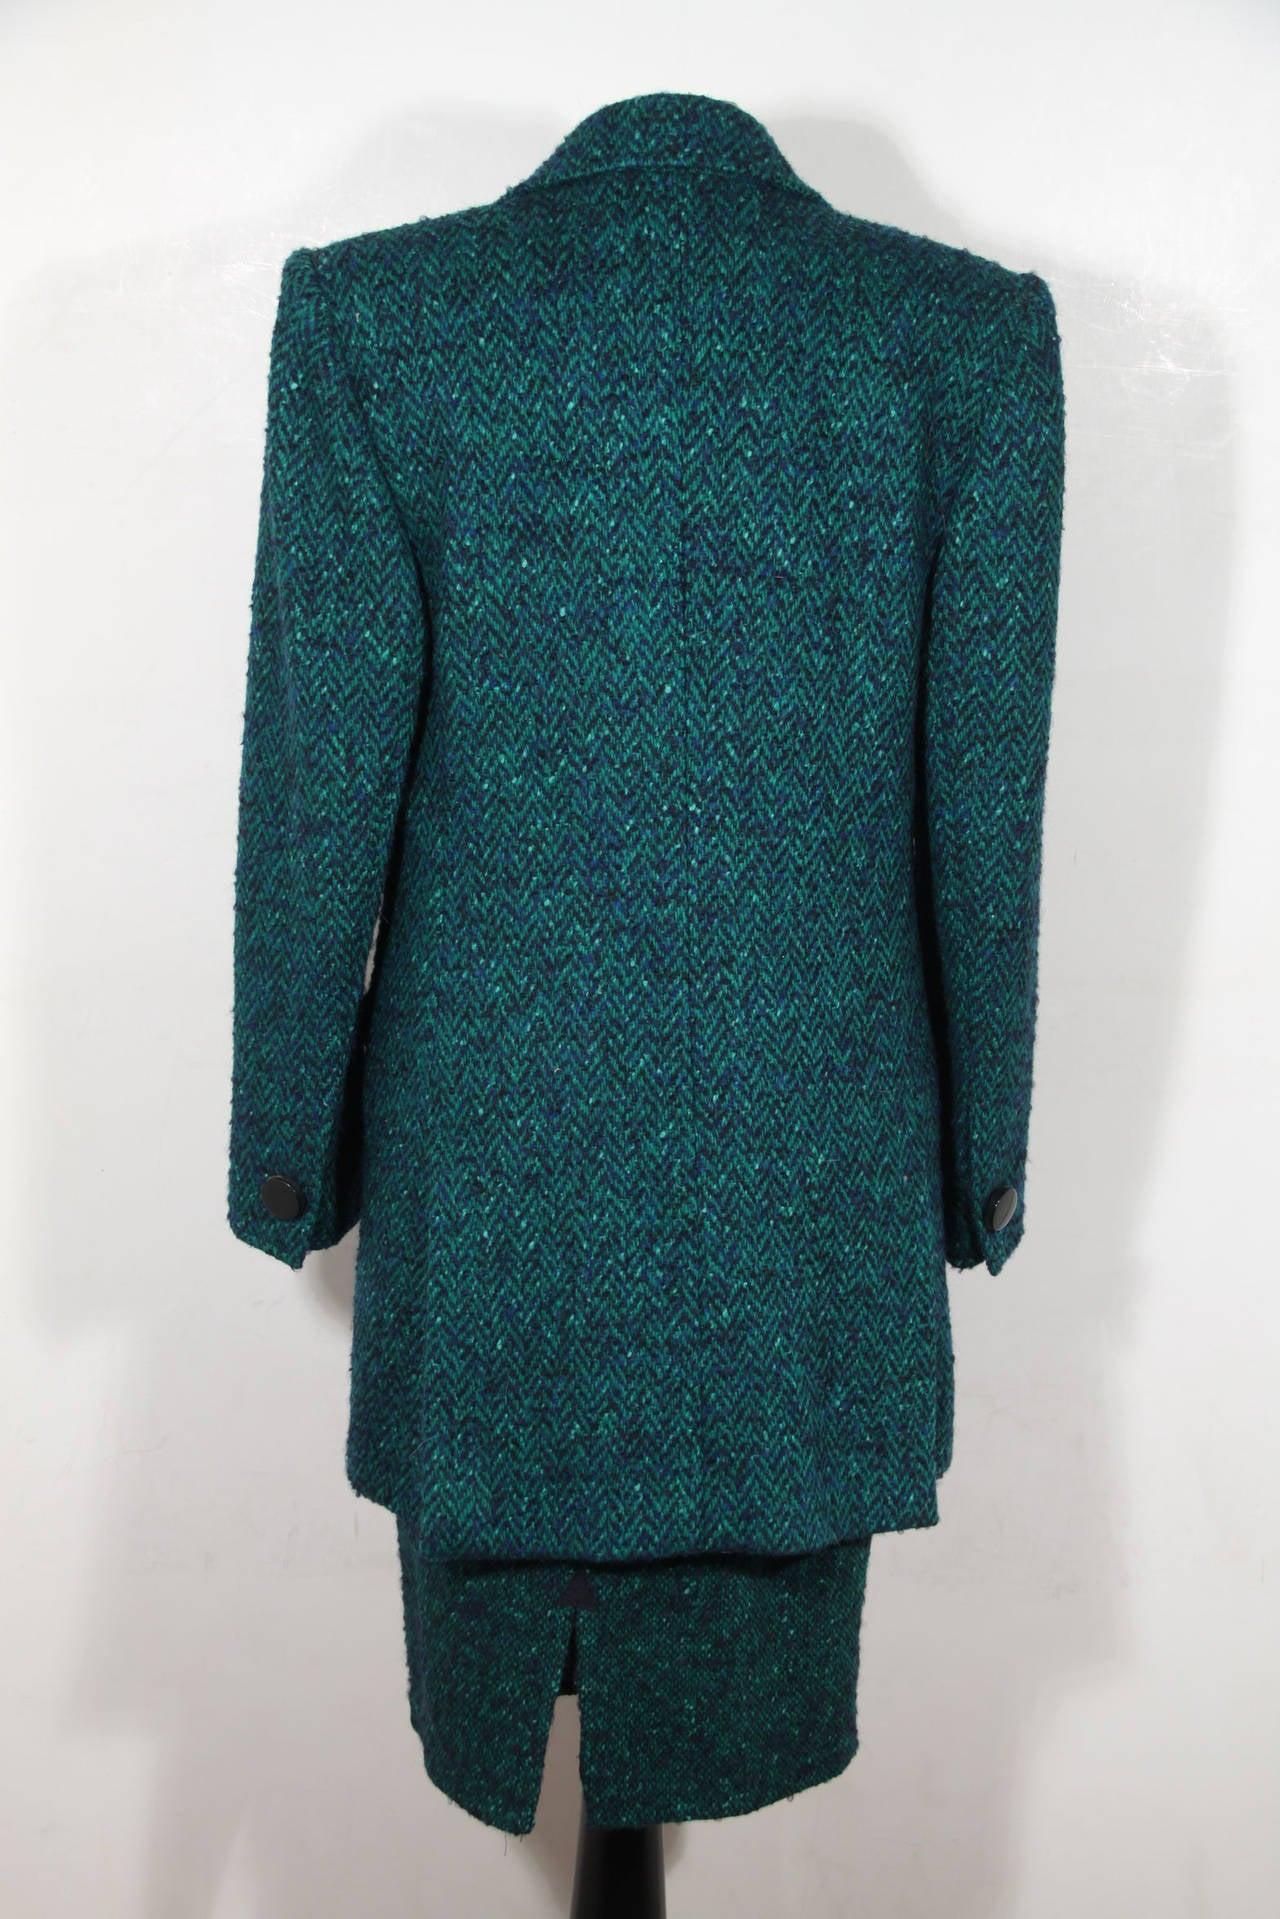 Women's ANDREA ODICINI Italian VINTAGE Green Tweed SUIT Coat & Skirt SET Sz 40 IT For Sale